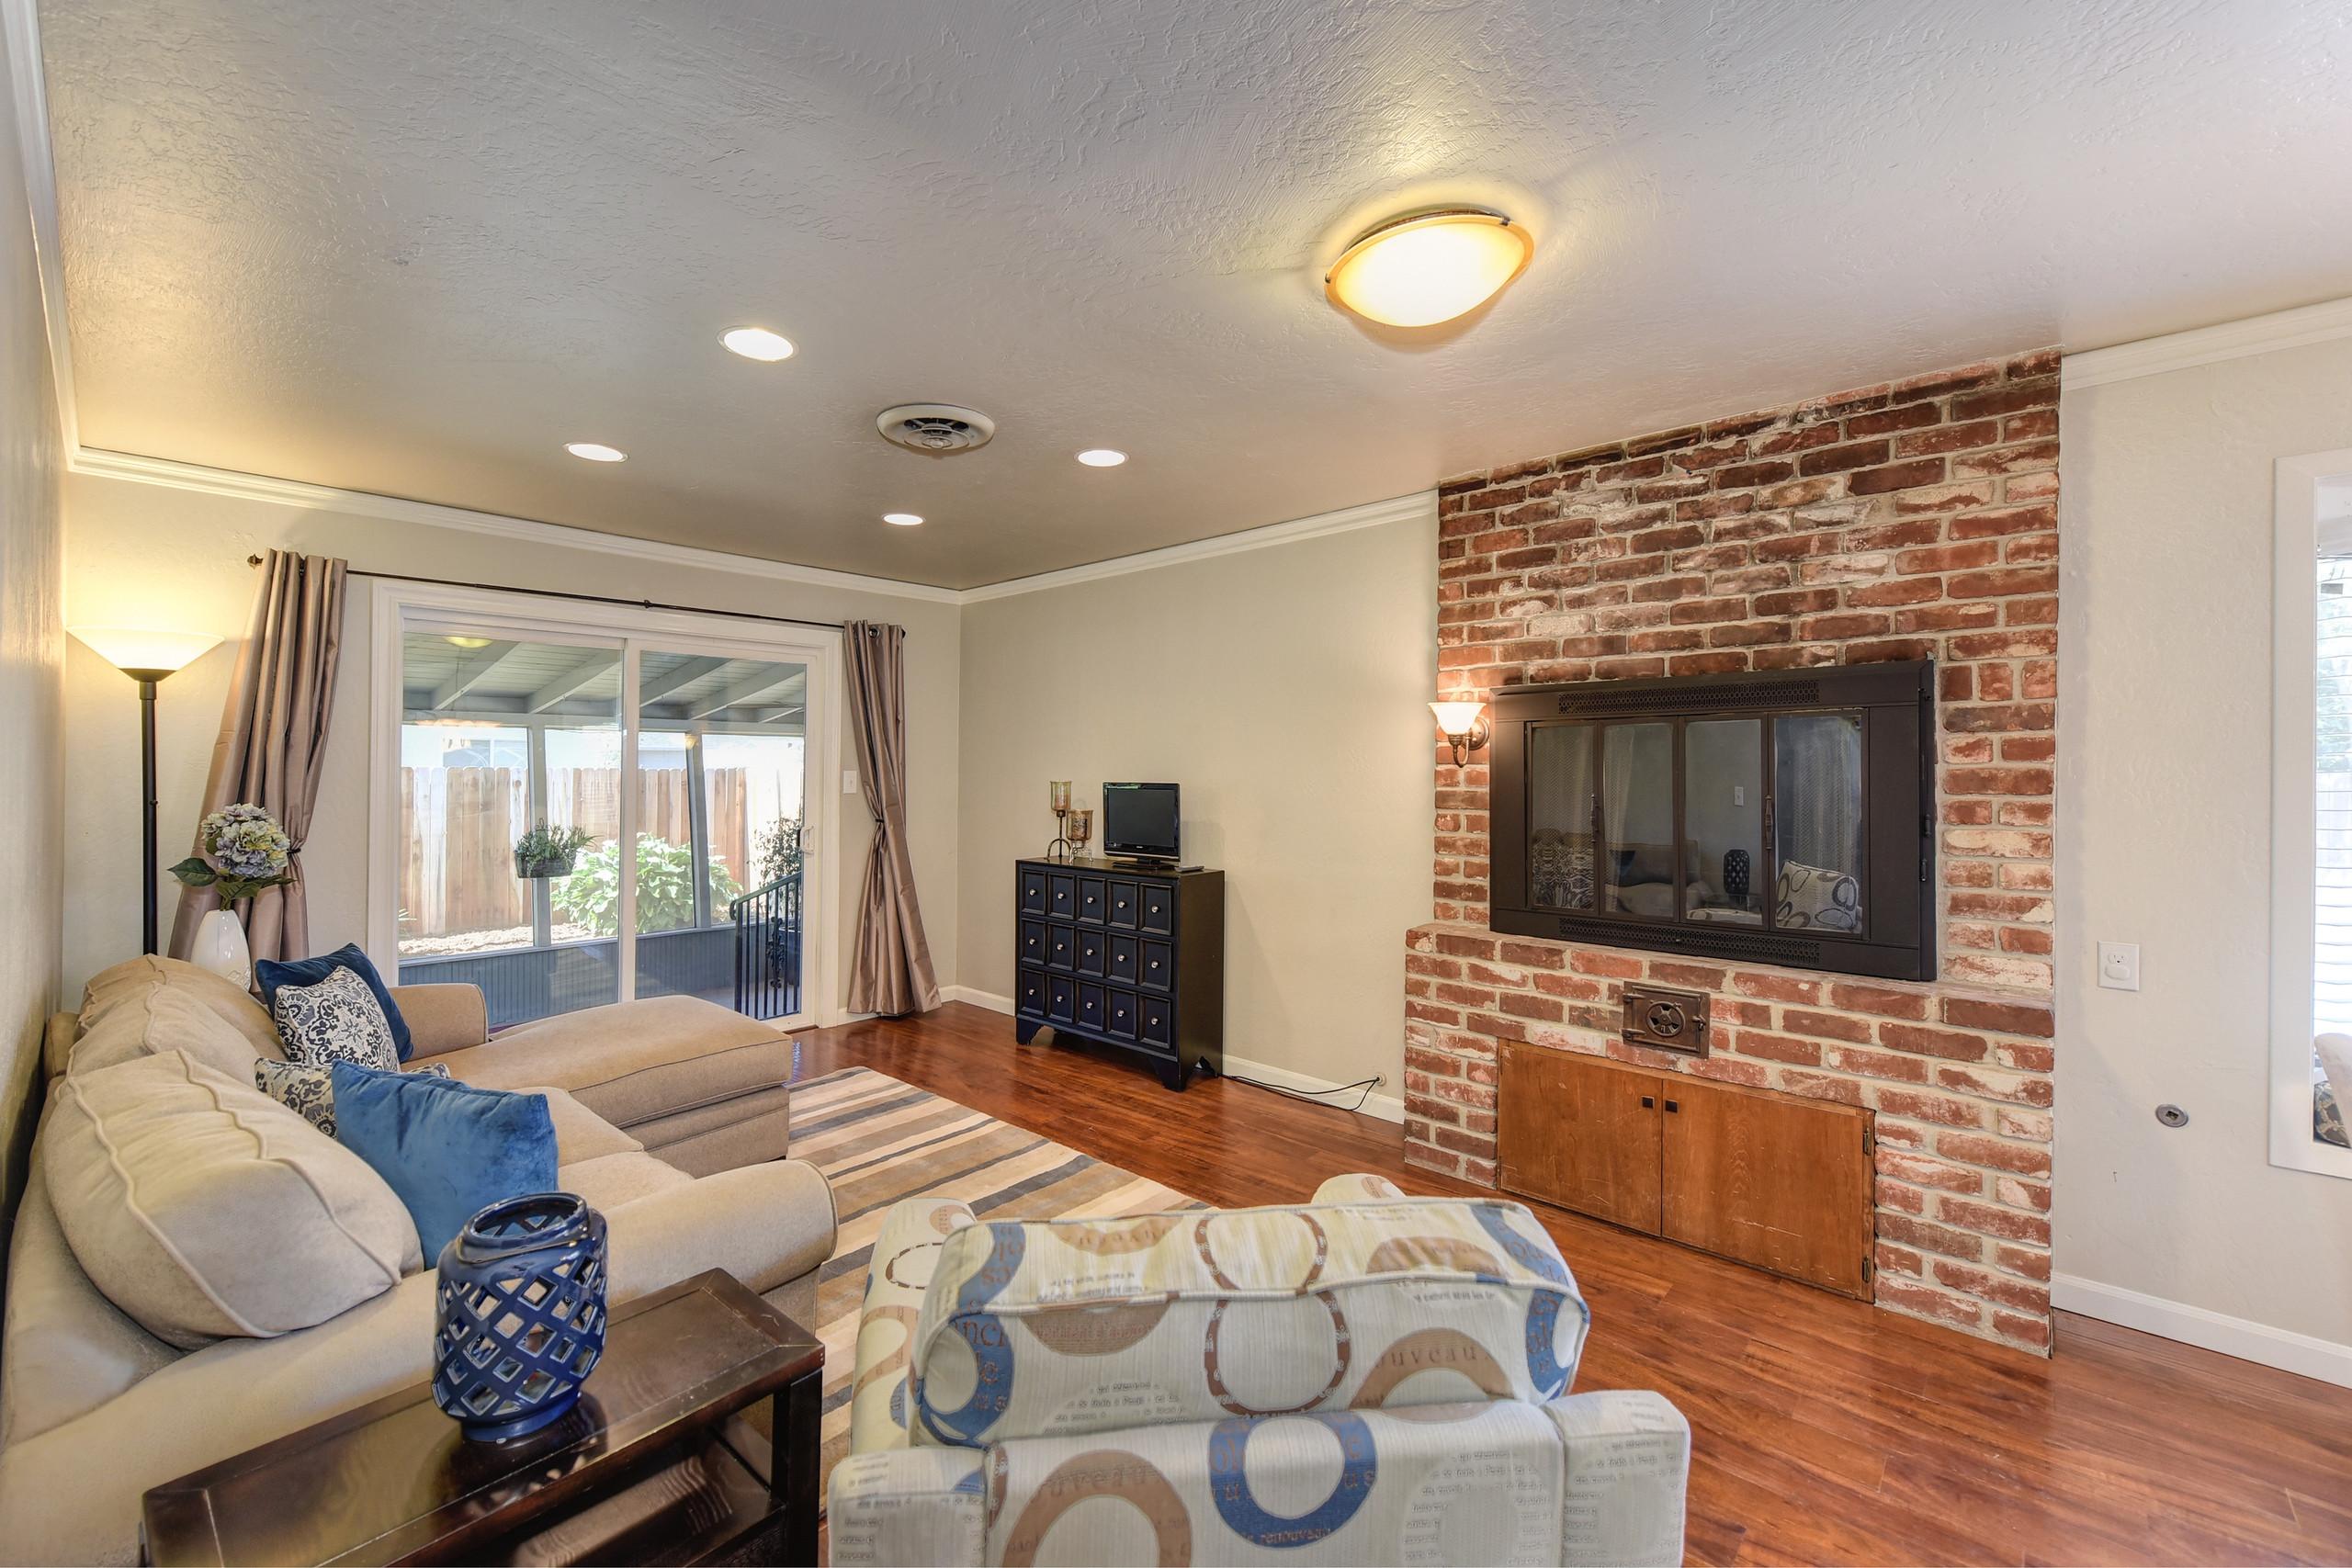 2208 Alegre Court Rancho Cordova CA 95670 ,Living Room3